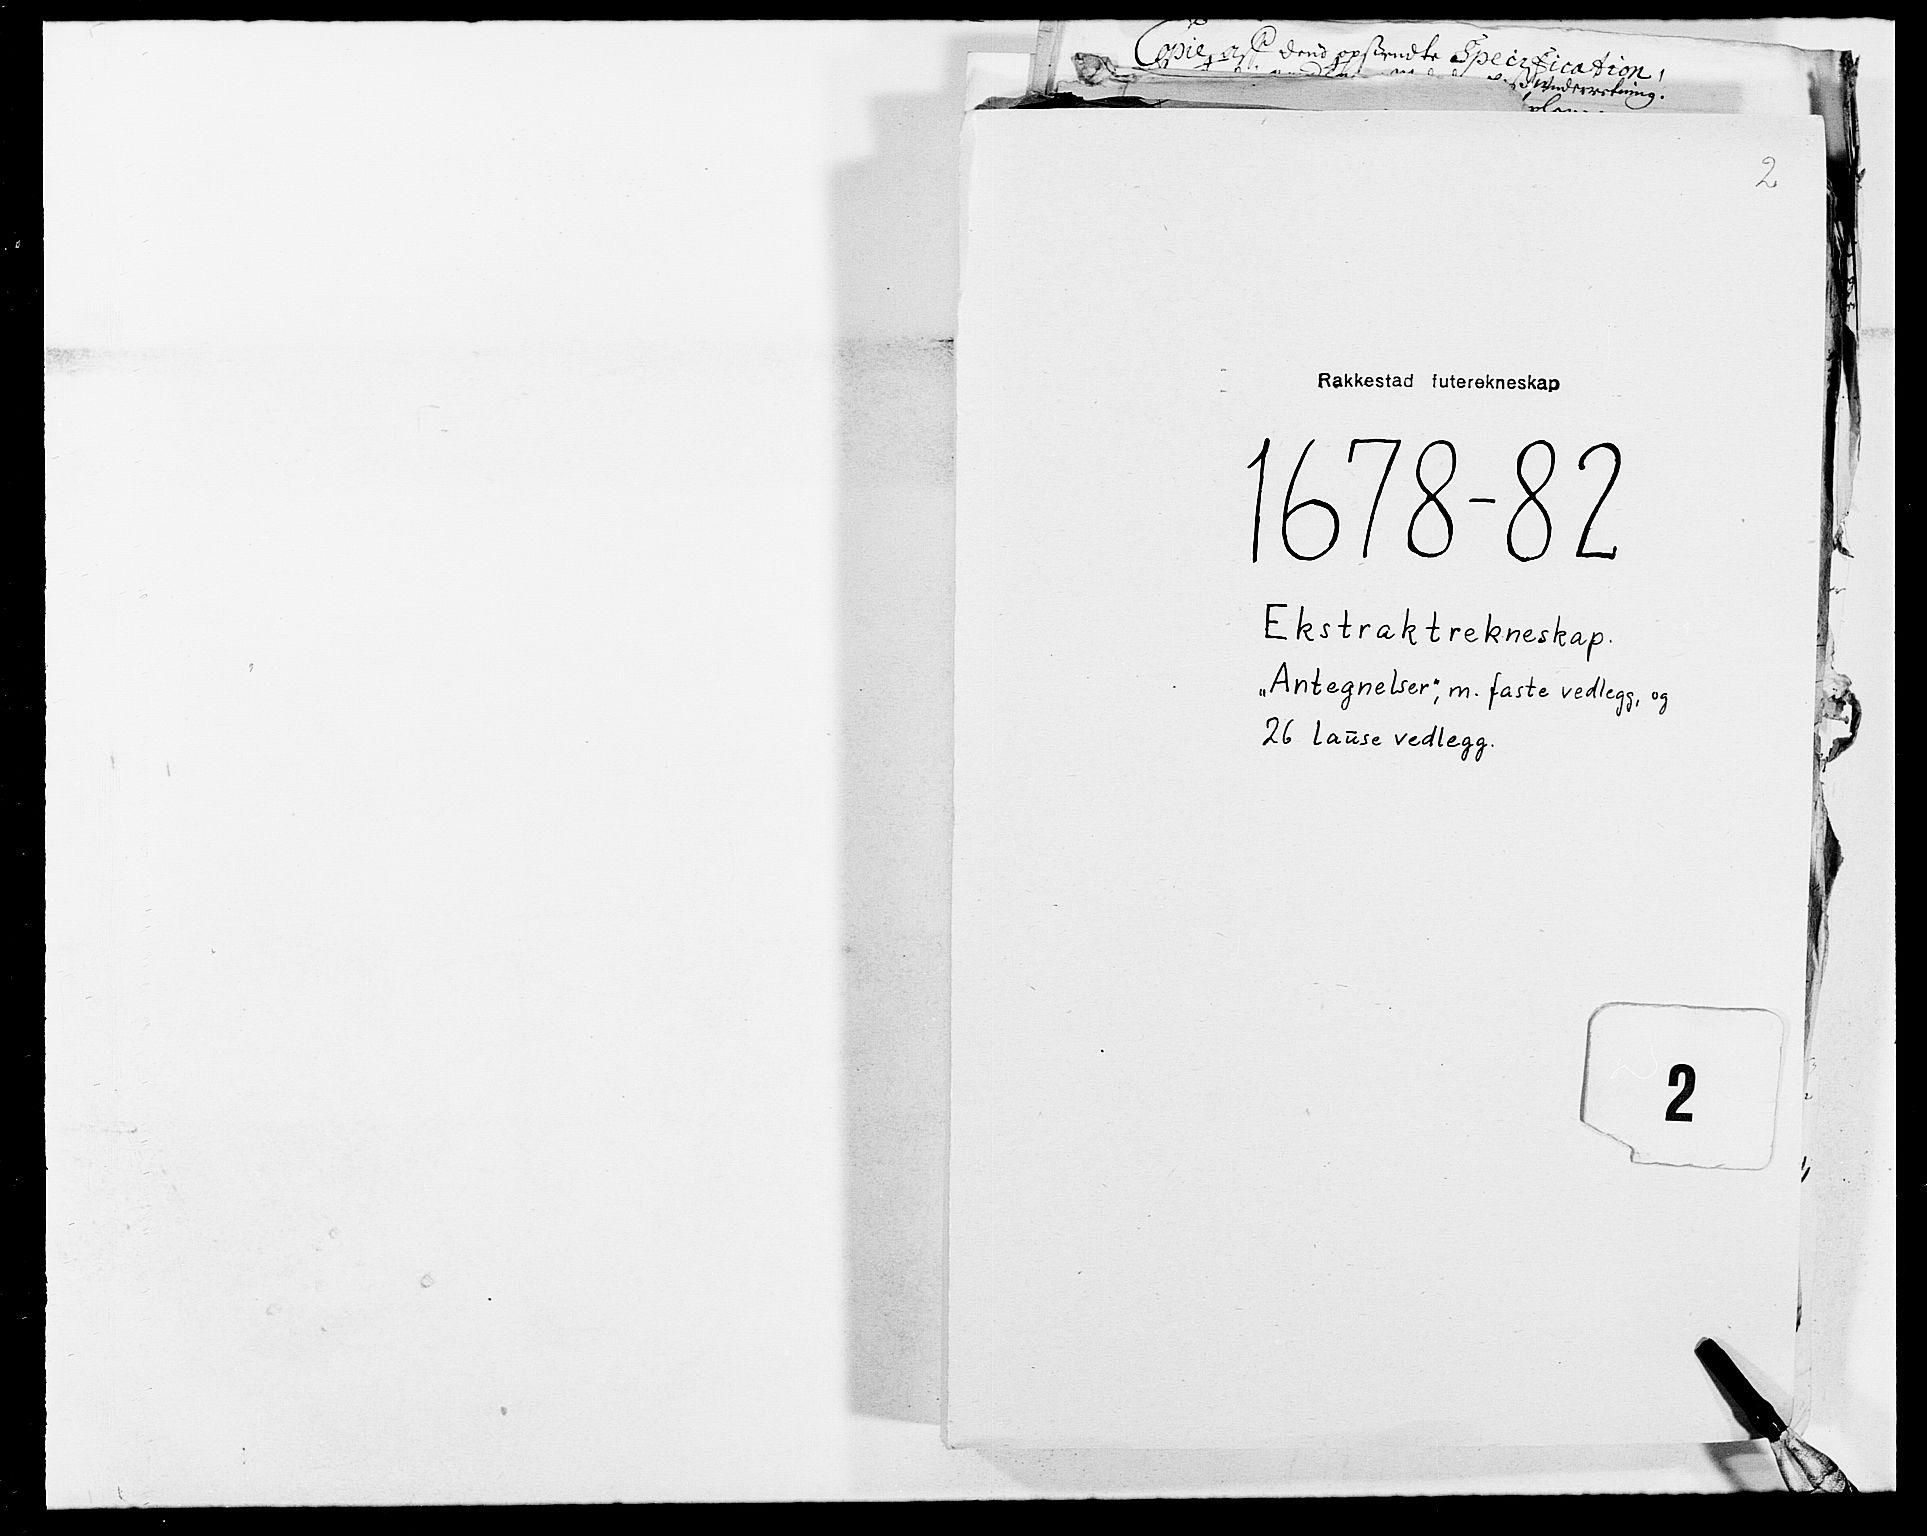 RA, Rentekammeret inntil 1814, Reviderte regnskaper, Fogderegnskap, R05/L0273: Fogderegnskap Rakkestad, 1682, s. 179